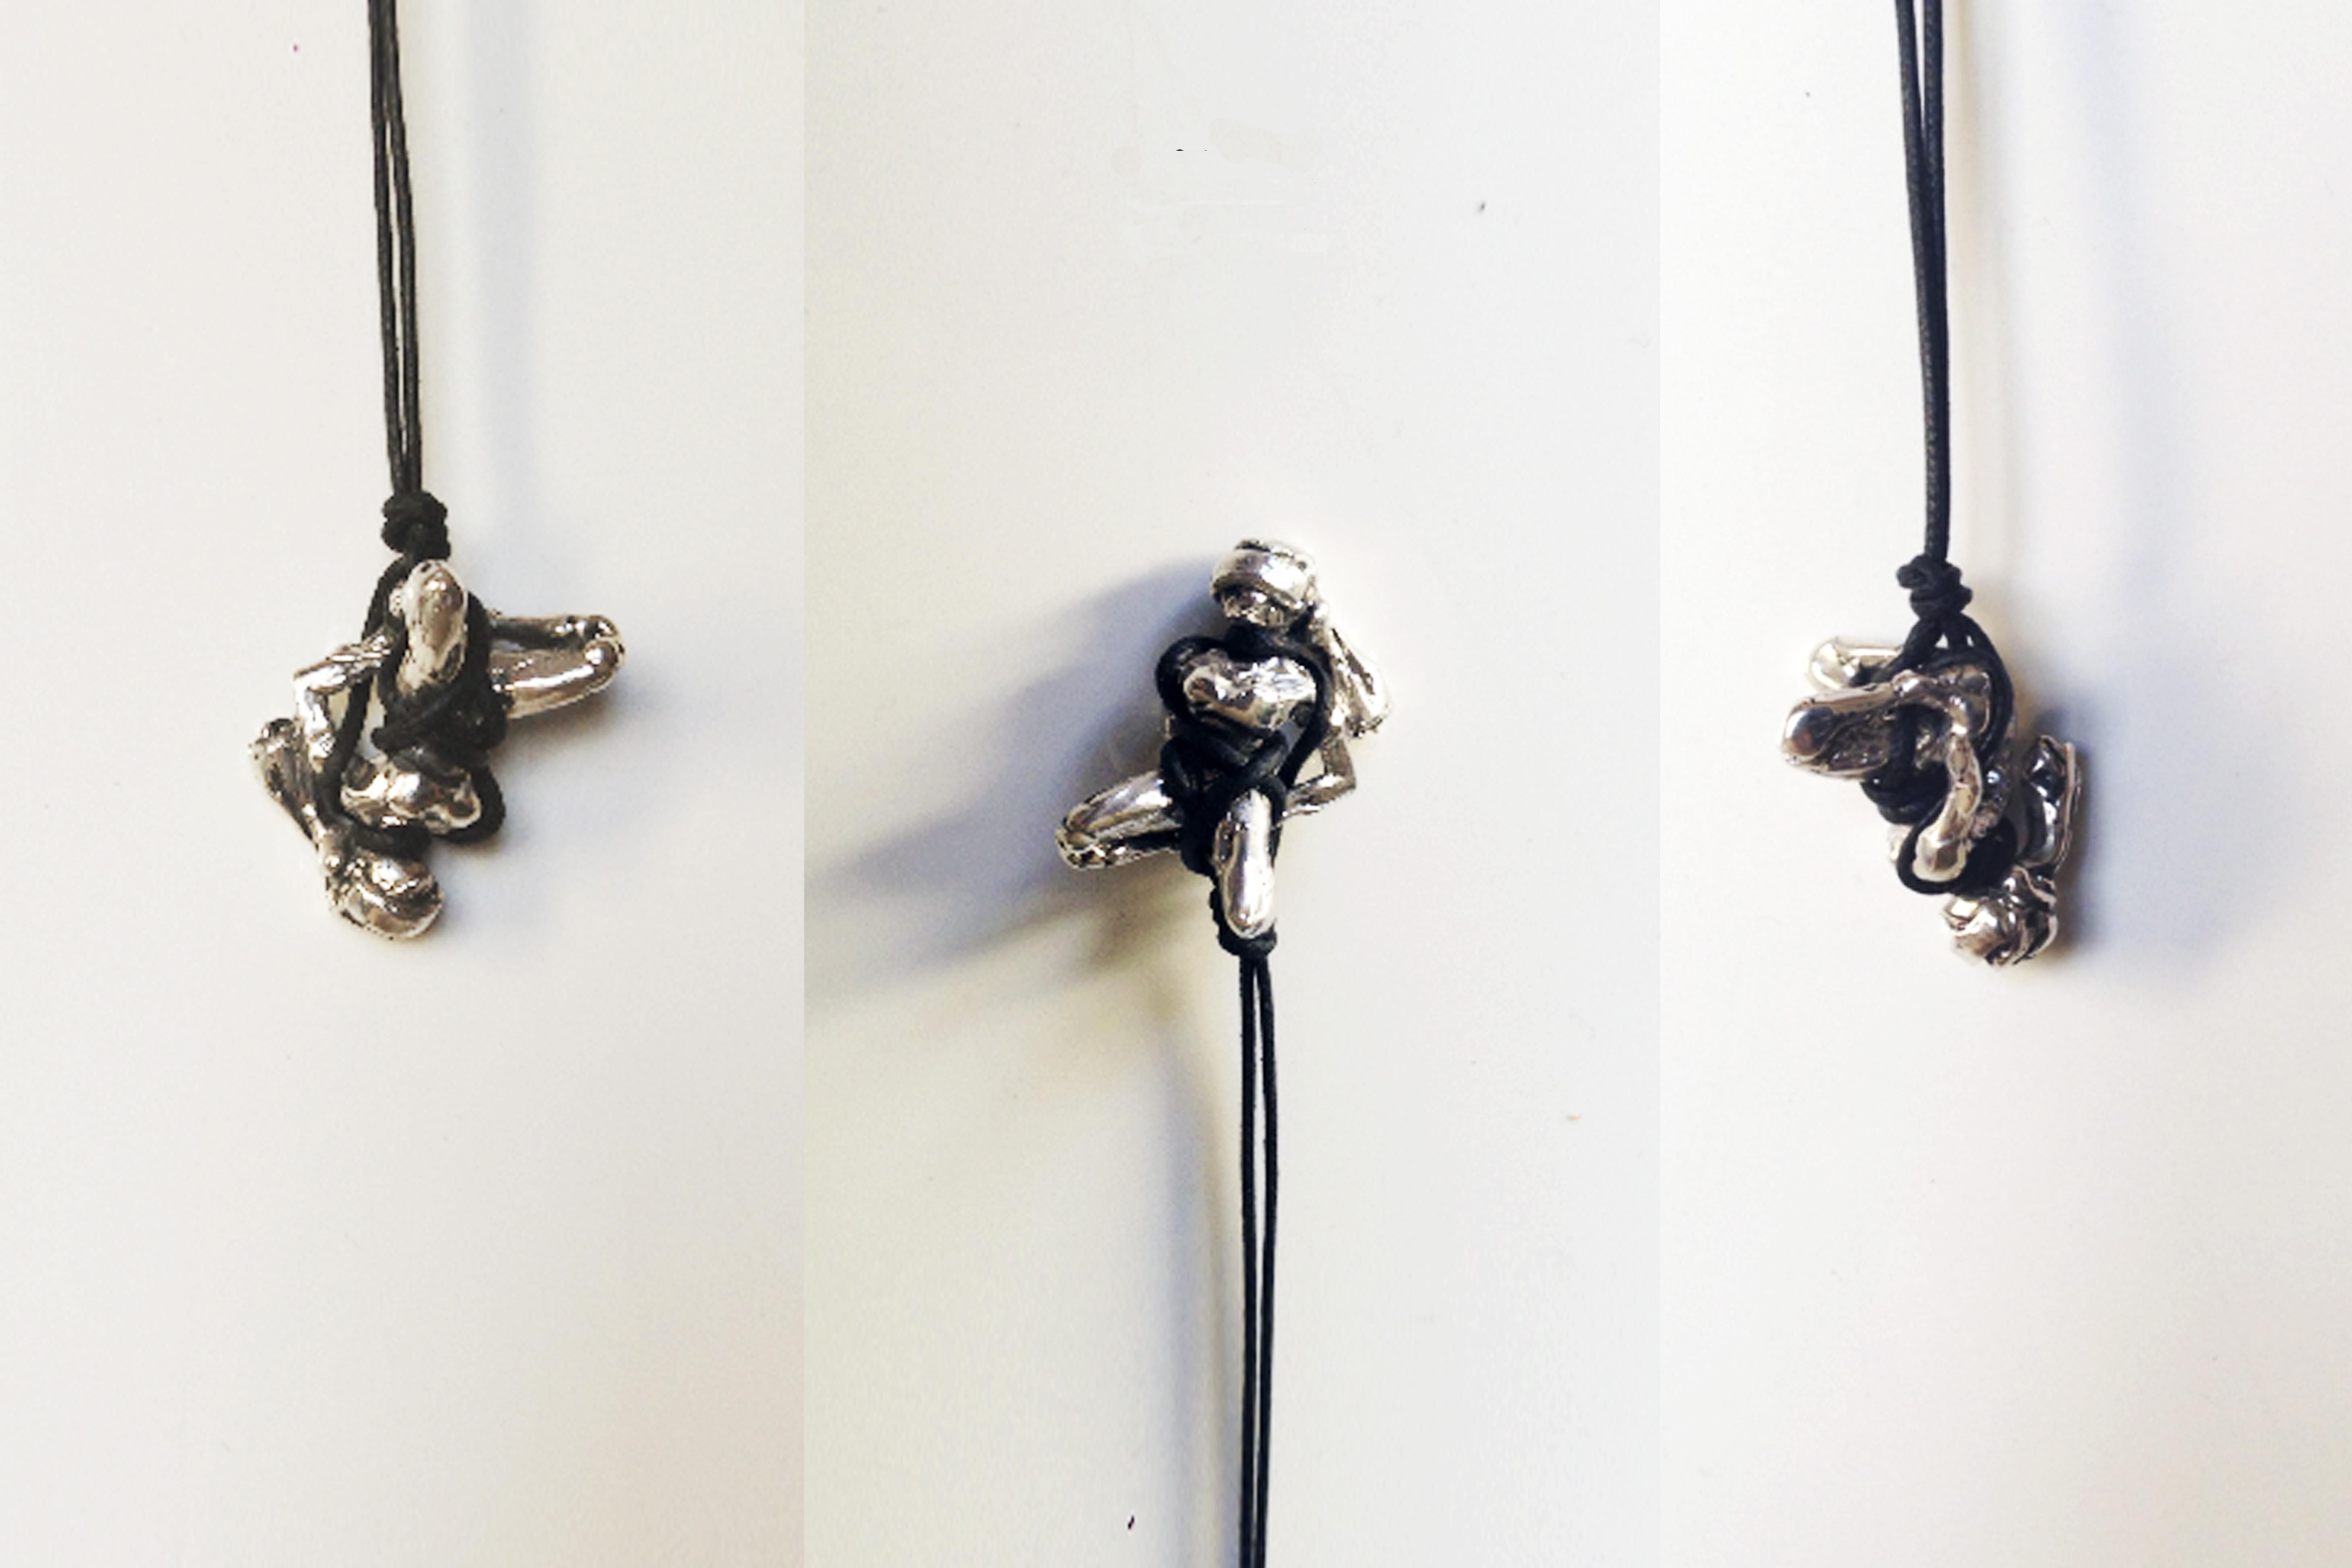 Vanesi BDSM necklace #2 in silver